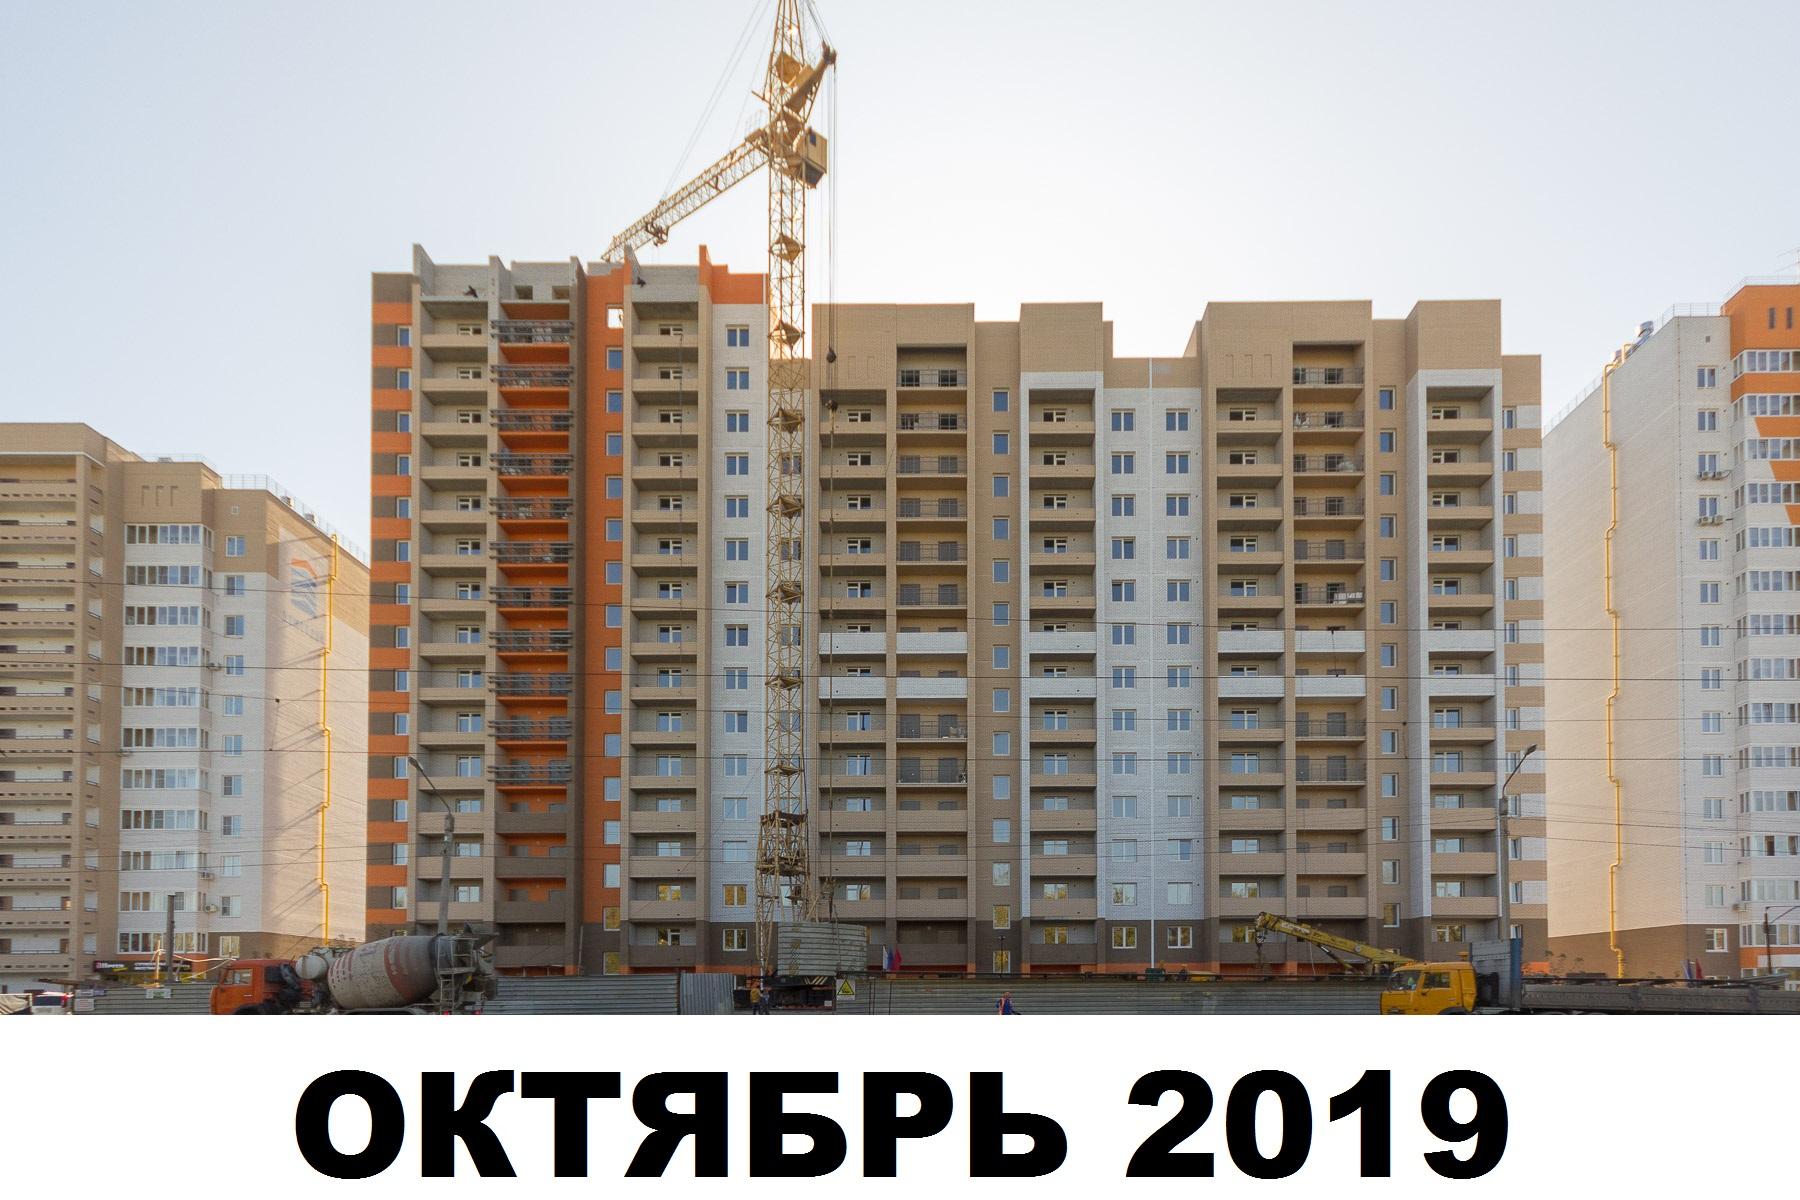 Октябрь 2019